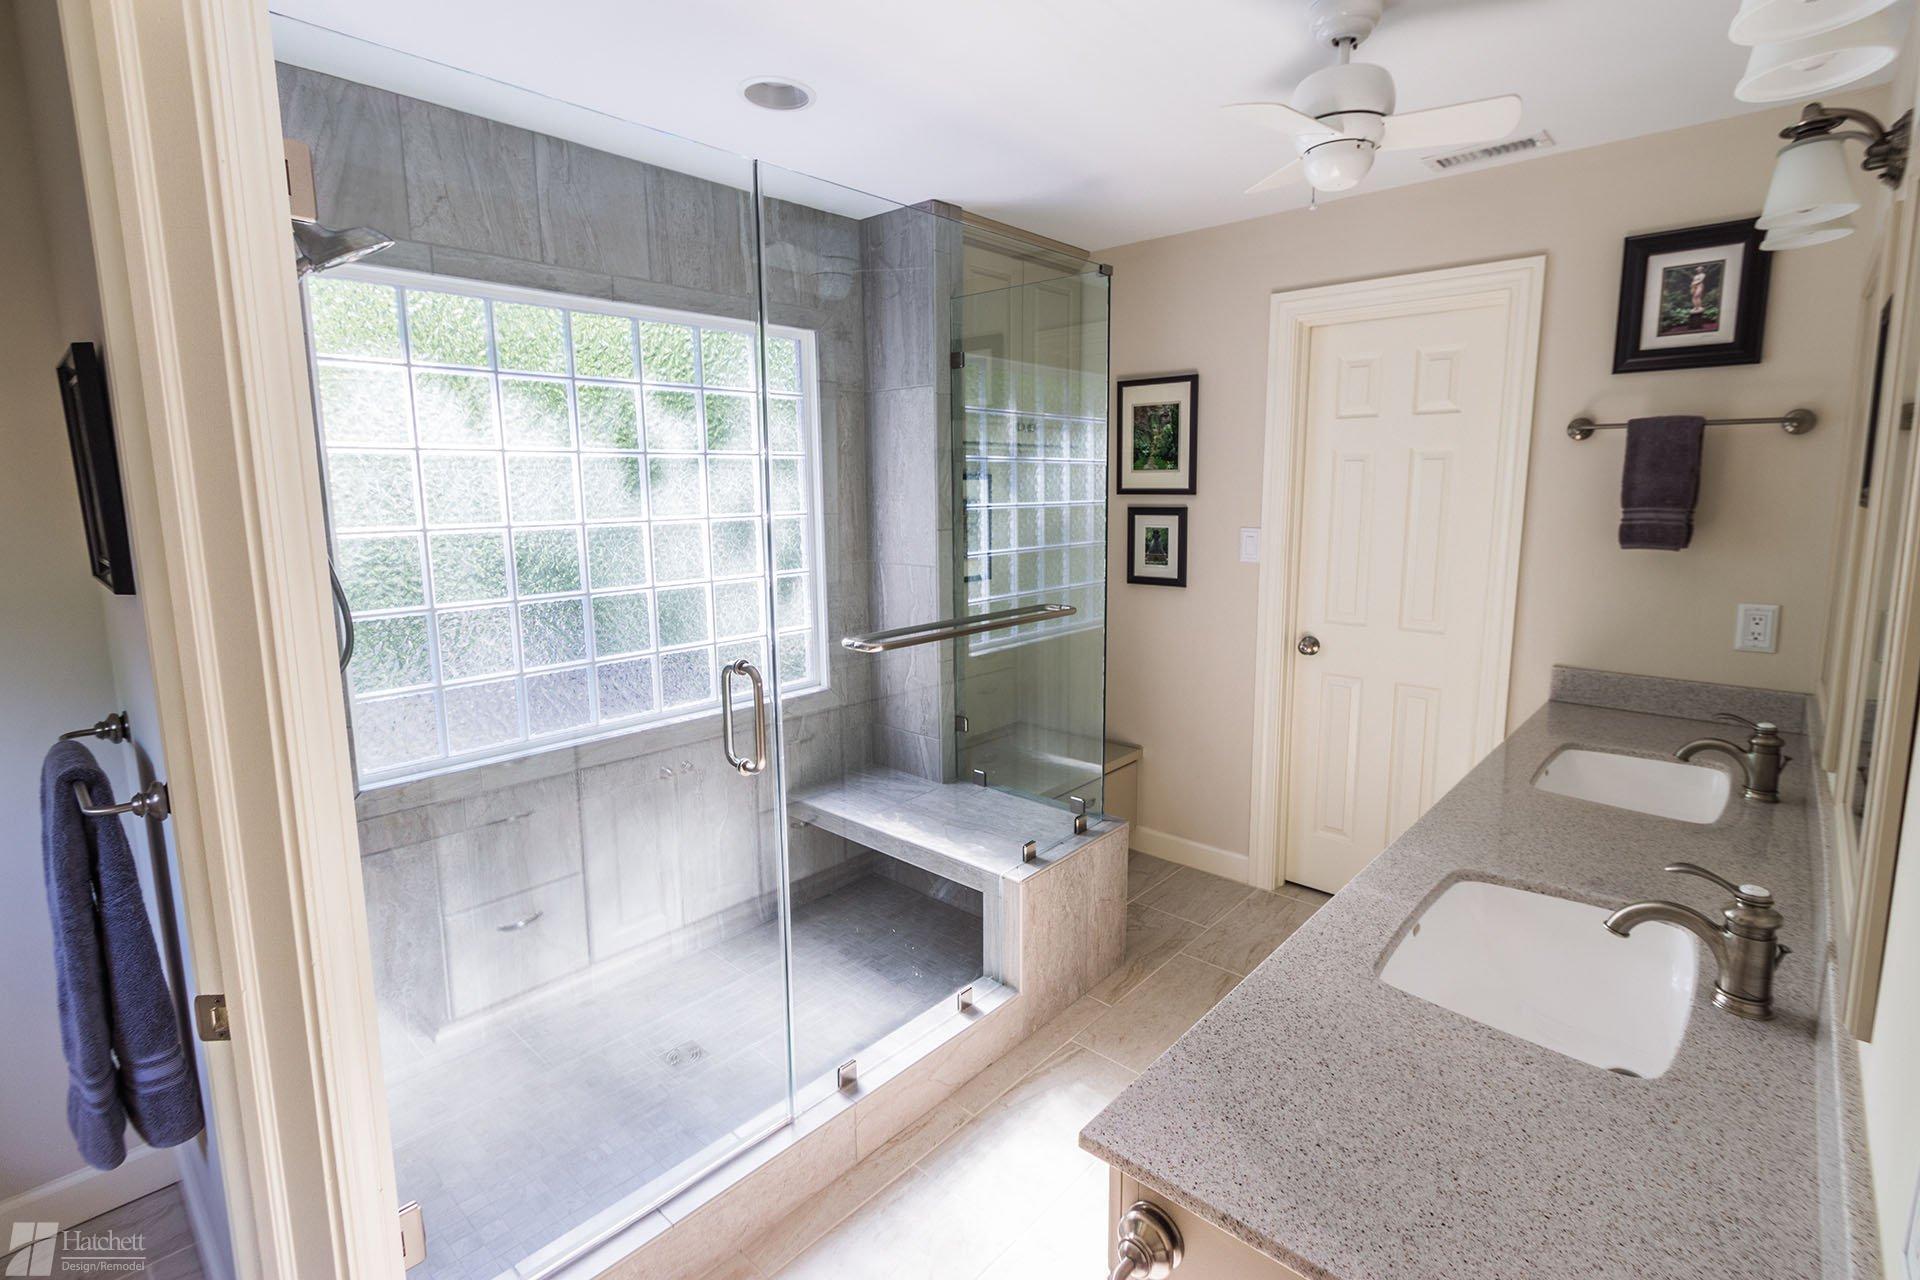 Zinskie Bathroom Remodel Hatchett